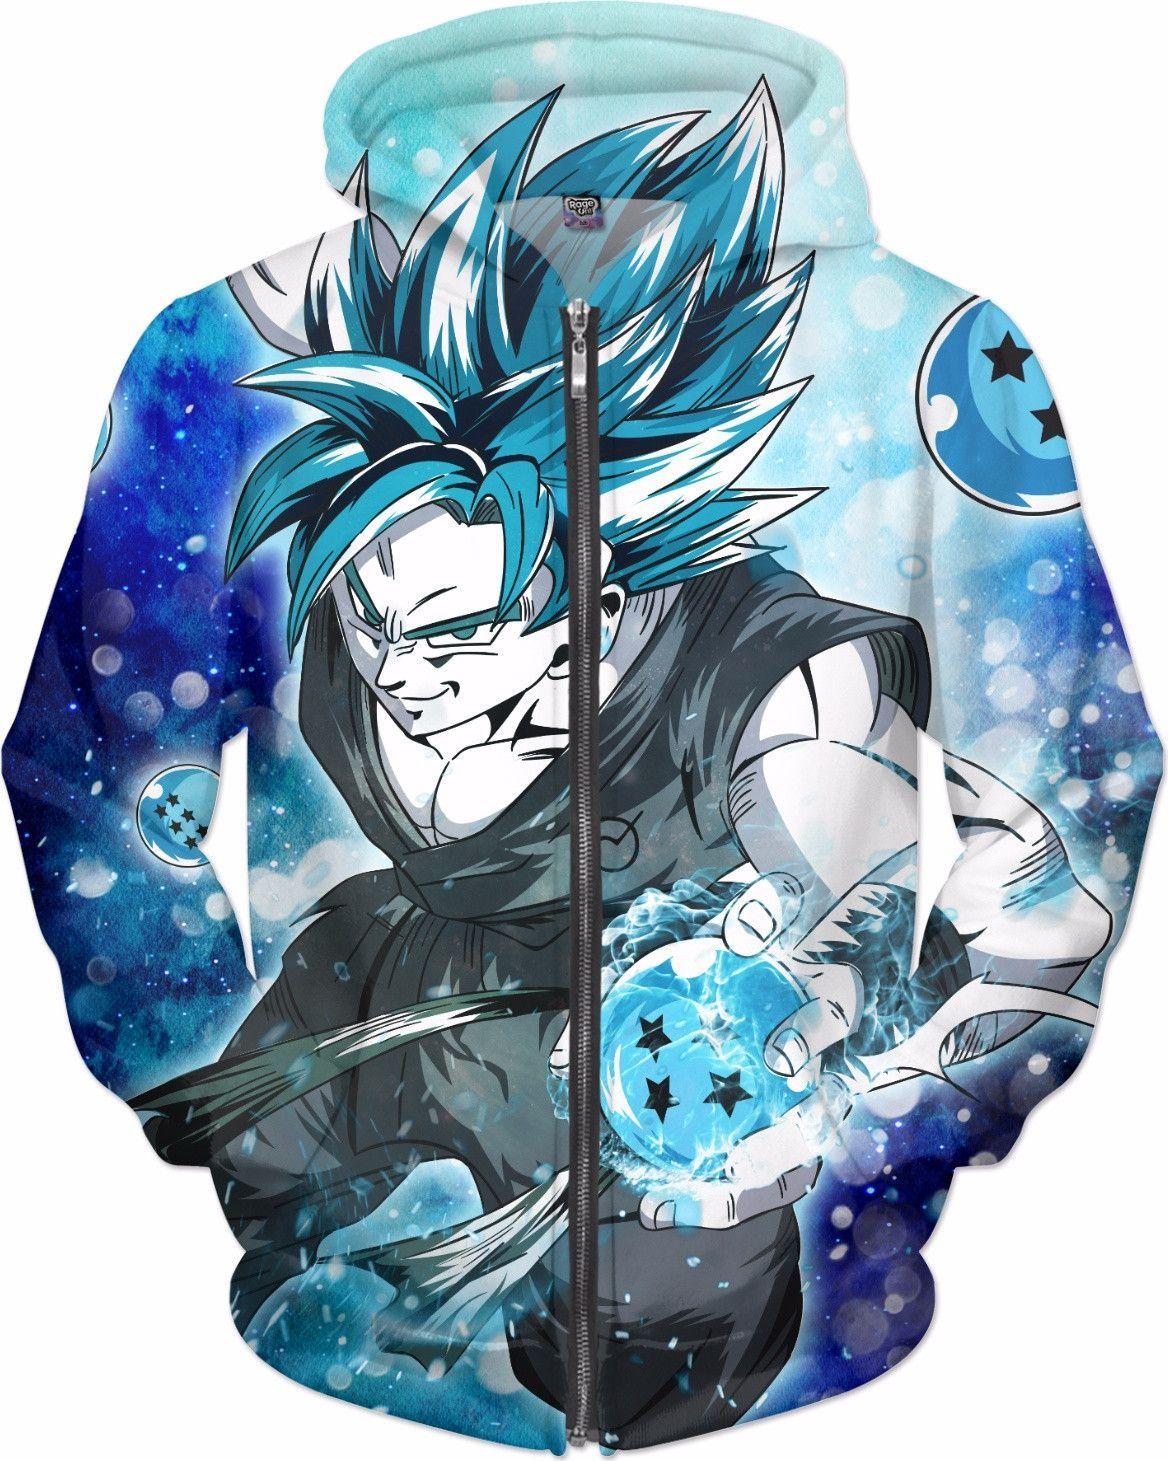 adb22ab1 Super Saiyan - Goku SSj Blue with dragon balls - All Over Print Zip Hoodie  - RO01174ZH